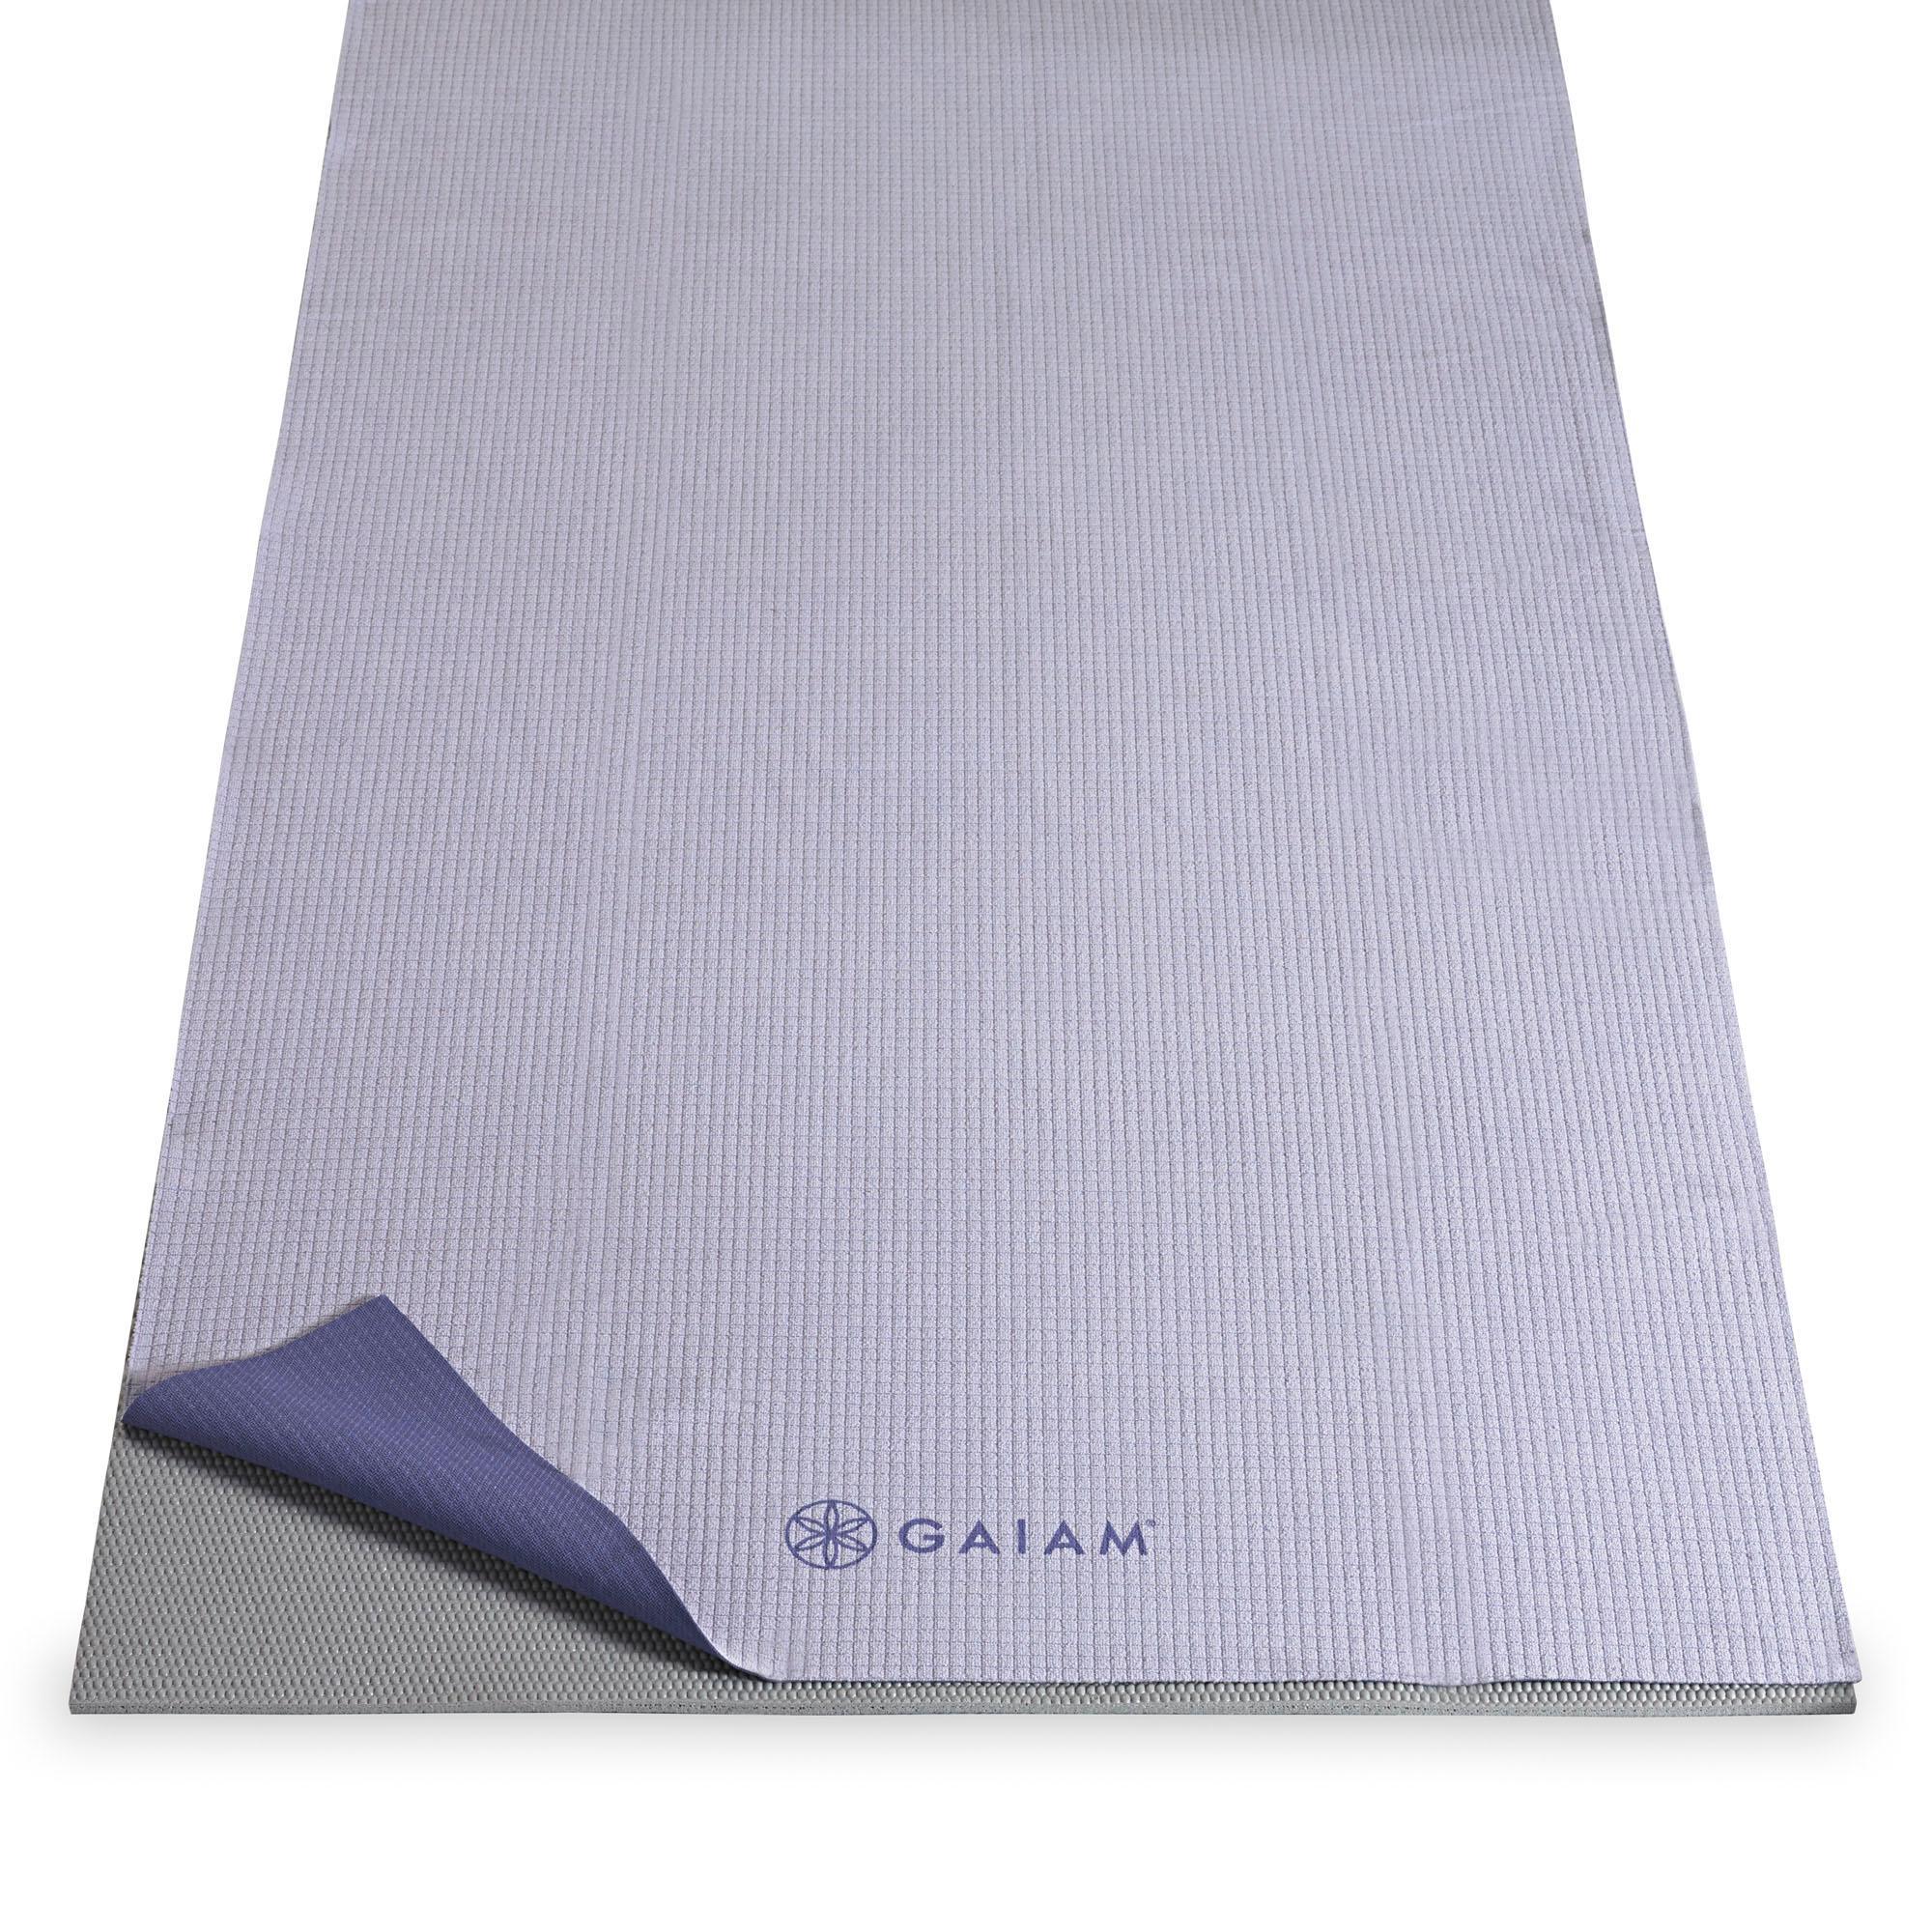 Travel Yoga Mat Or Towel: Amazon.com : Gaiam Travel Yoga Mat, Blue : Yoga Towels